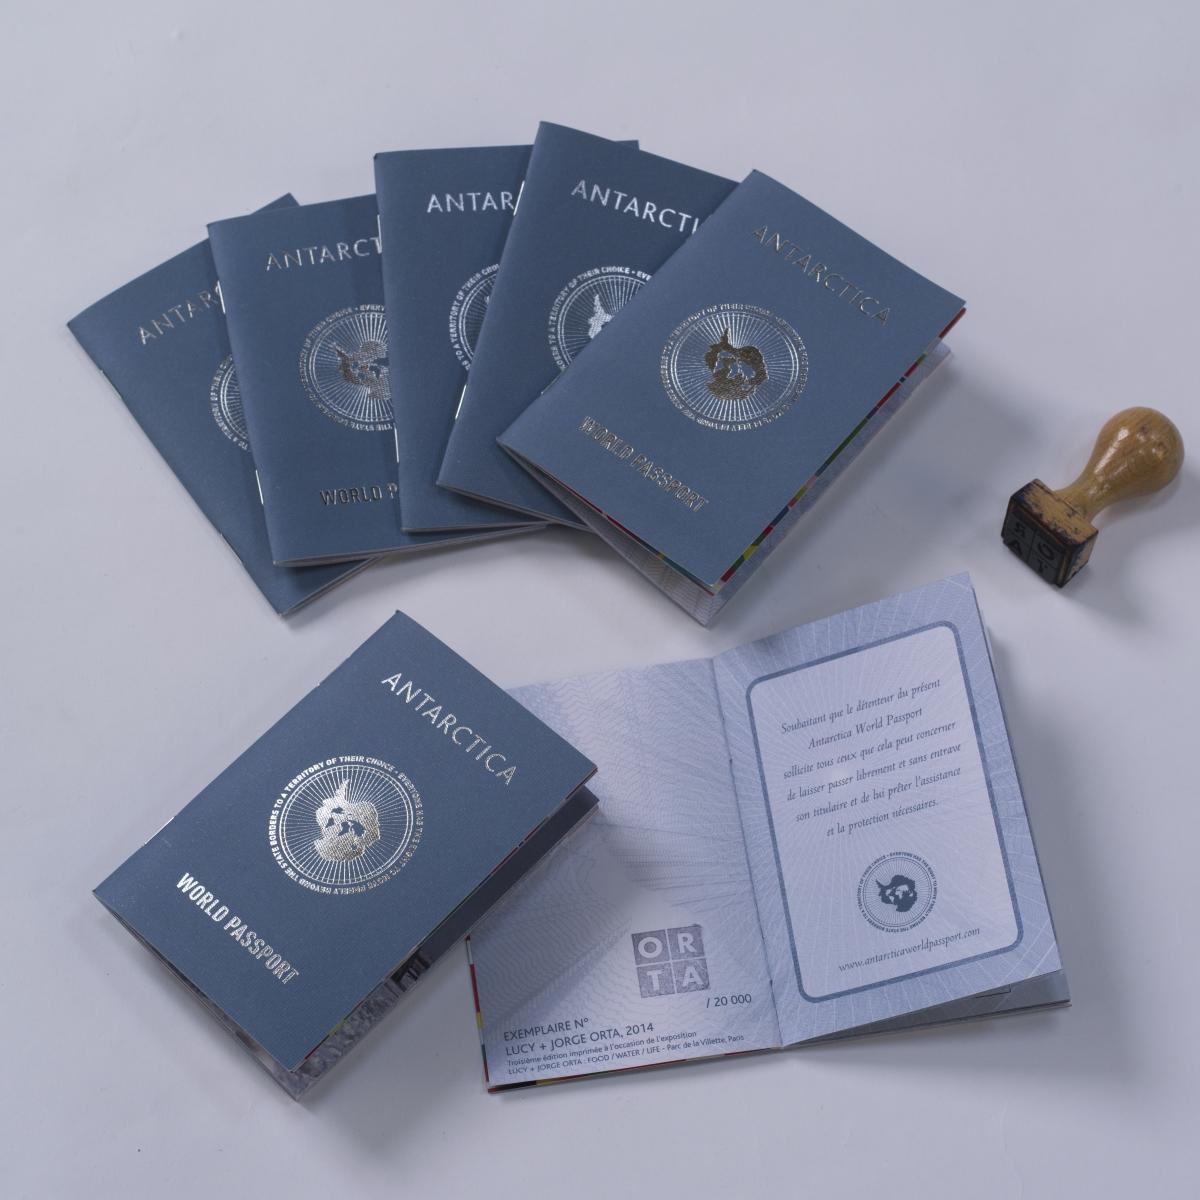 Passport designs for the Antarctica World Passport artwork (© Lucy + Jorge Orta)